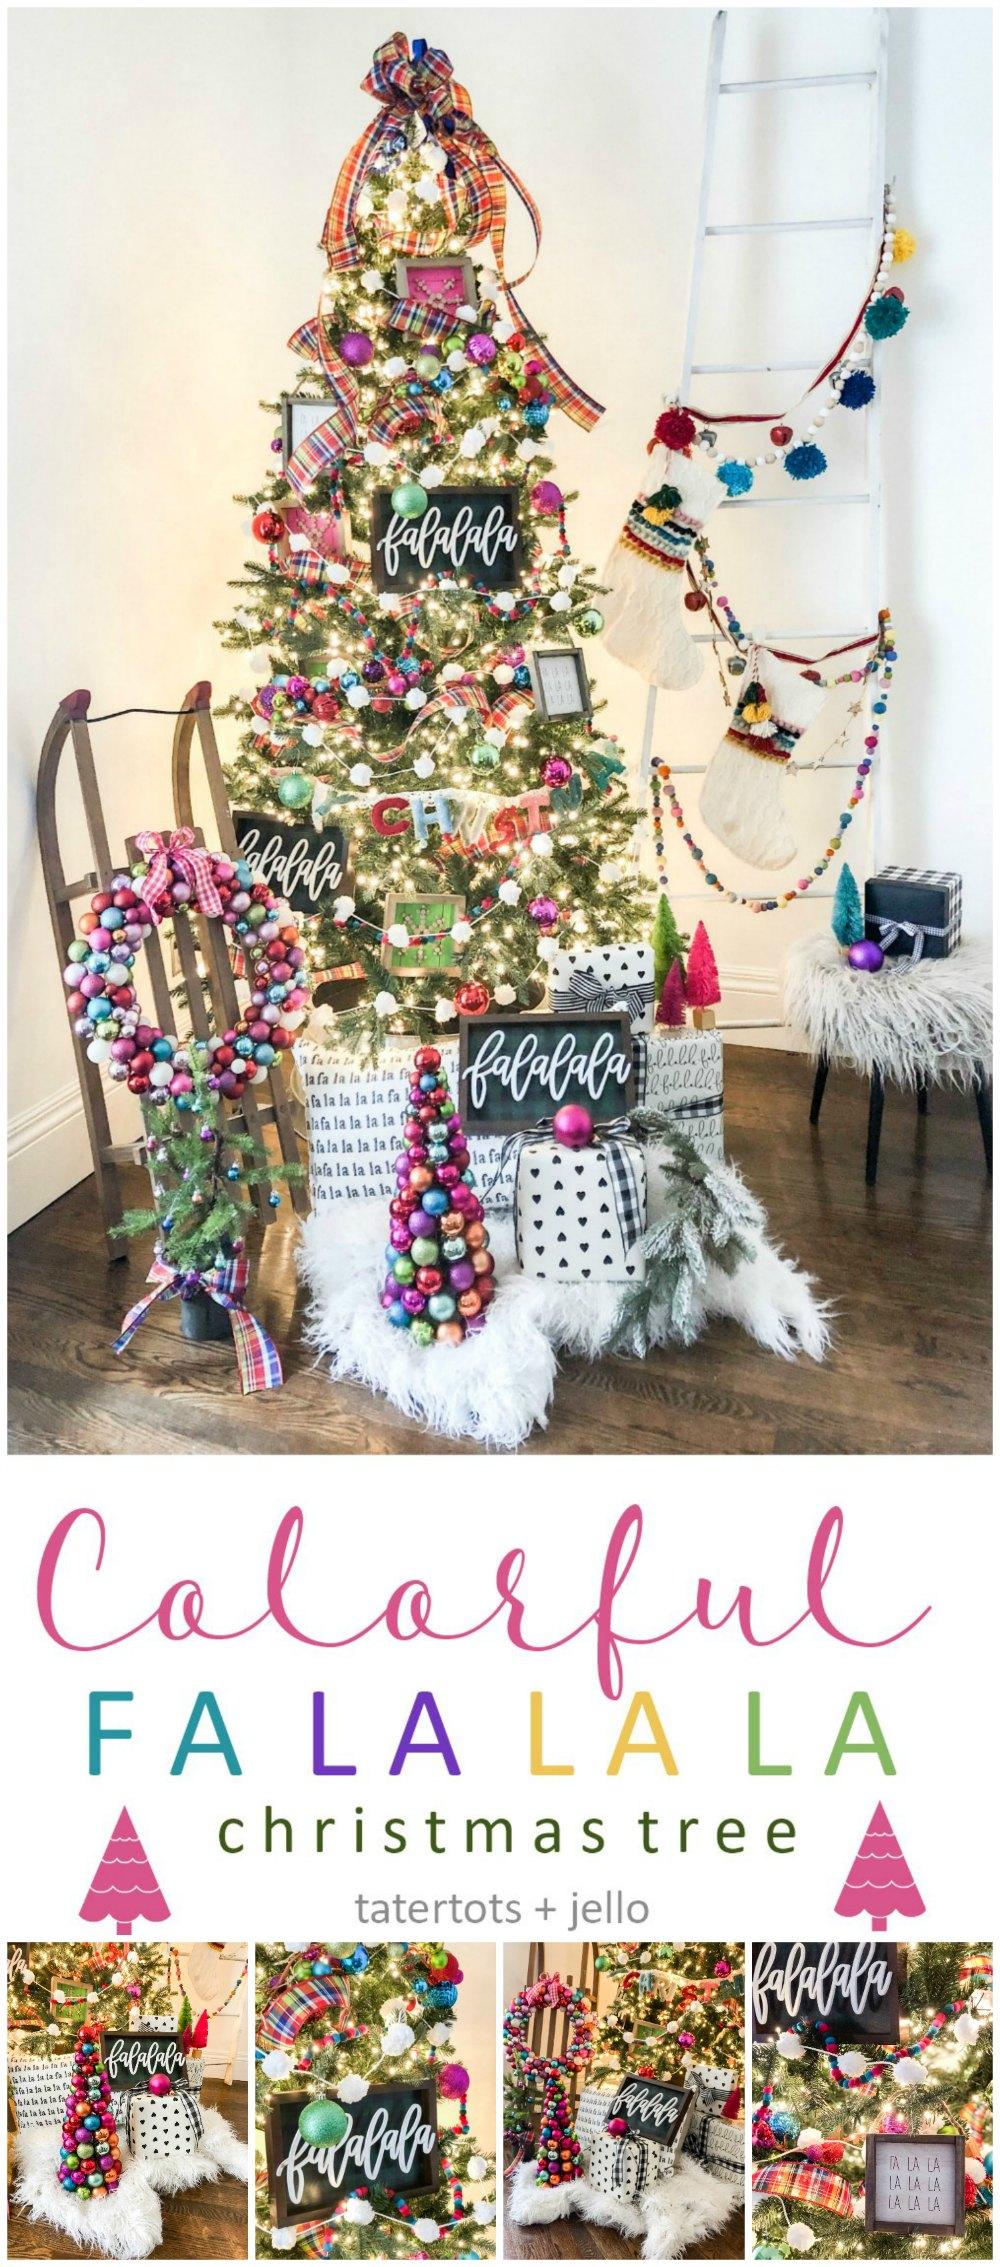 FALALA Colorful Christmas Tree! Create a vibrant, playful Christmas tree with ALL the colors this holiday season!